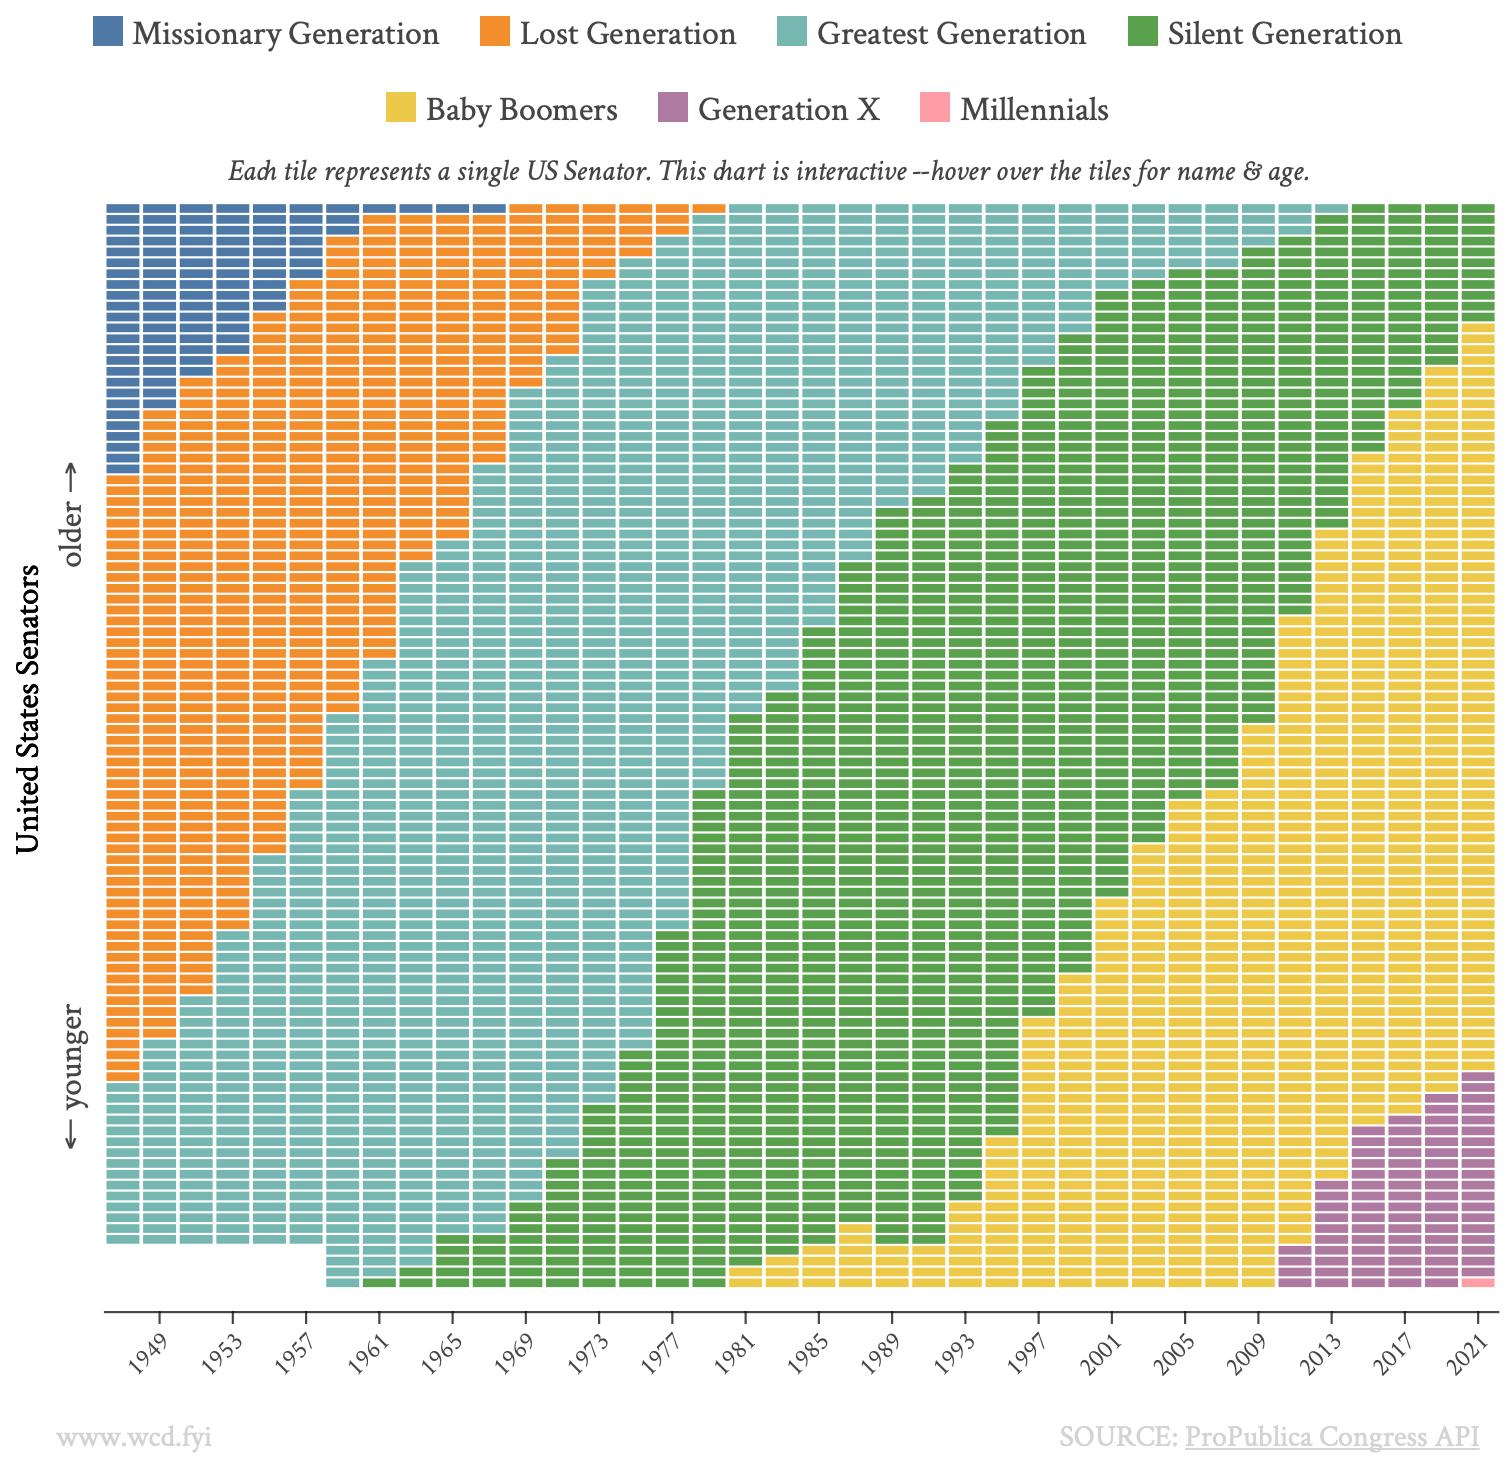 Dos visualizaciones de datos interesantes